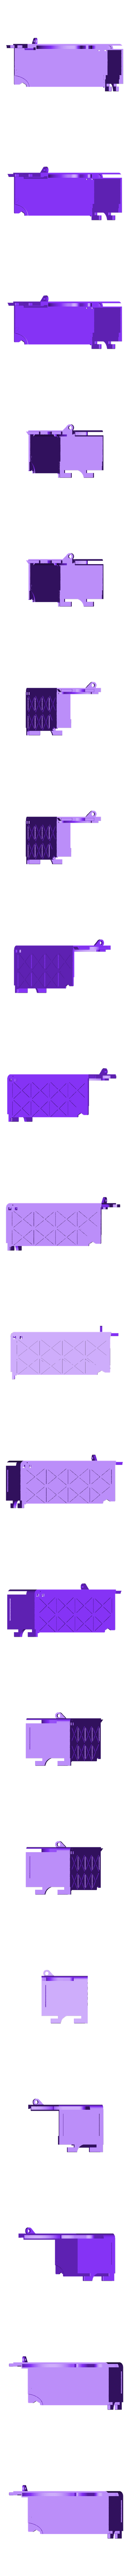 Cont liv 1 n2.stl Download STL file Multiple container ( closed 180x370mm) construction Contenitore multipla trasportabile Multibox • 3D printable design, mikifly10